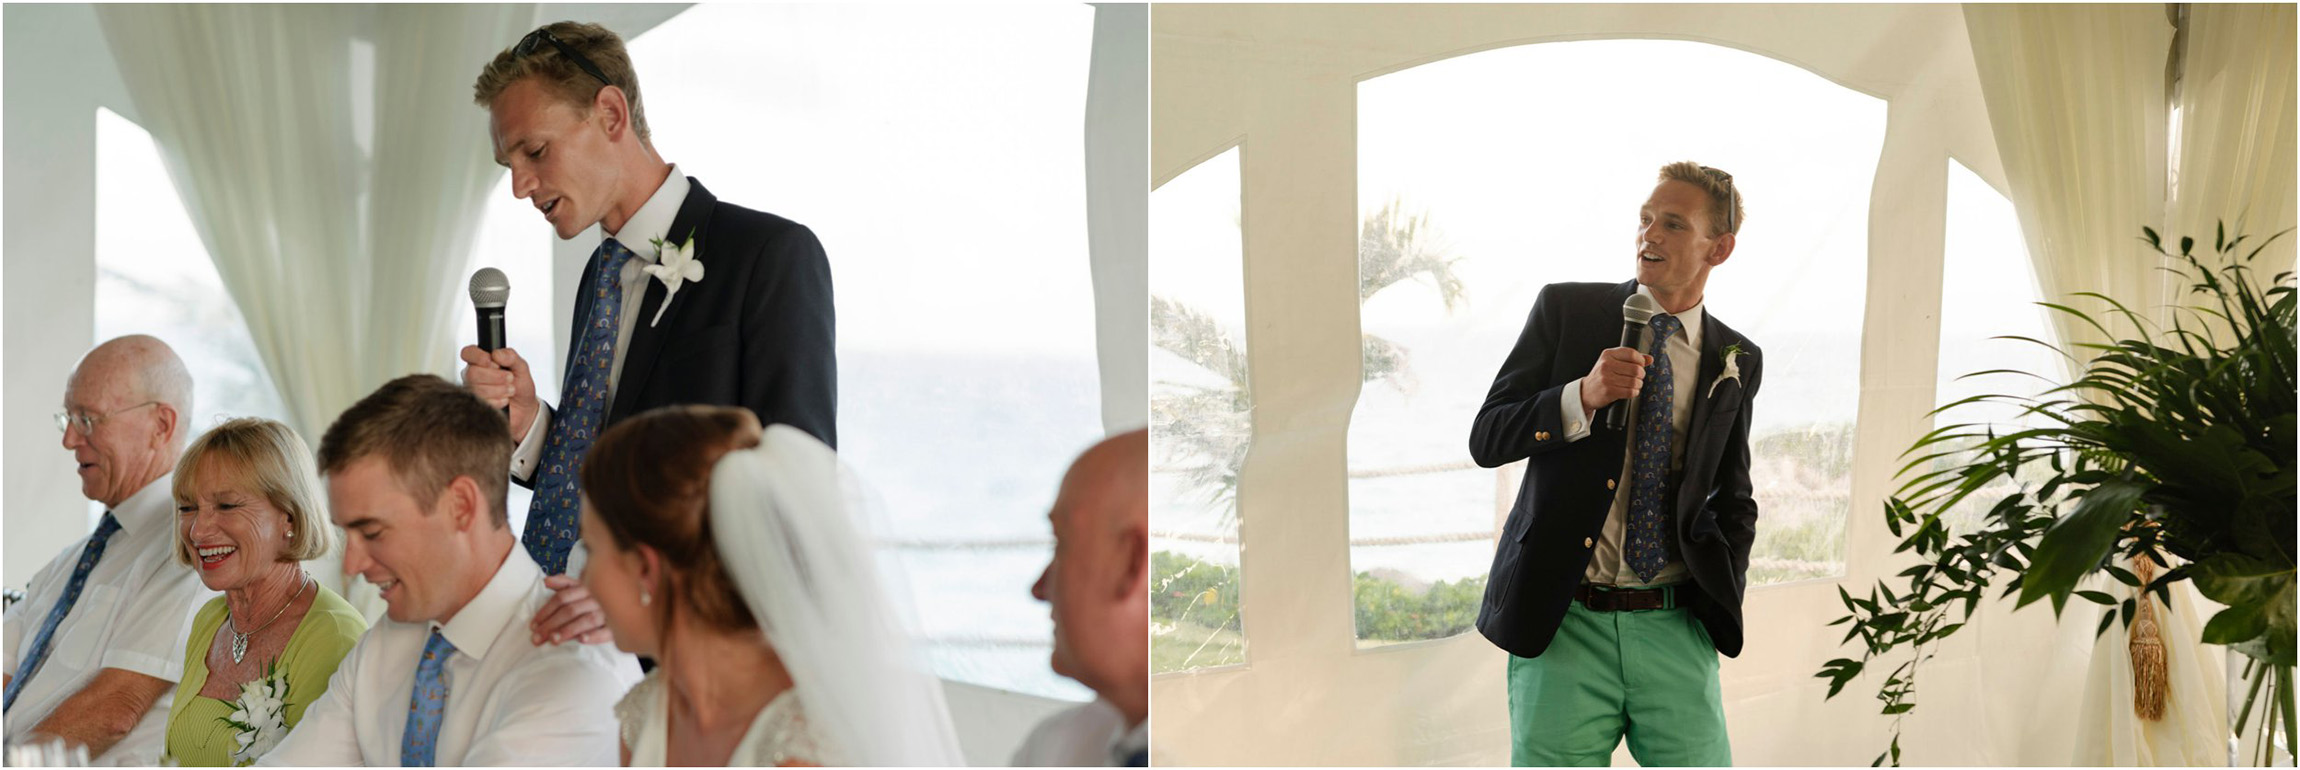 ©FianderFoto_Bermuda Wedding Photographer_Mid Ocean_Rachel_Angus_105.jpg